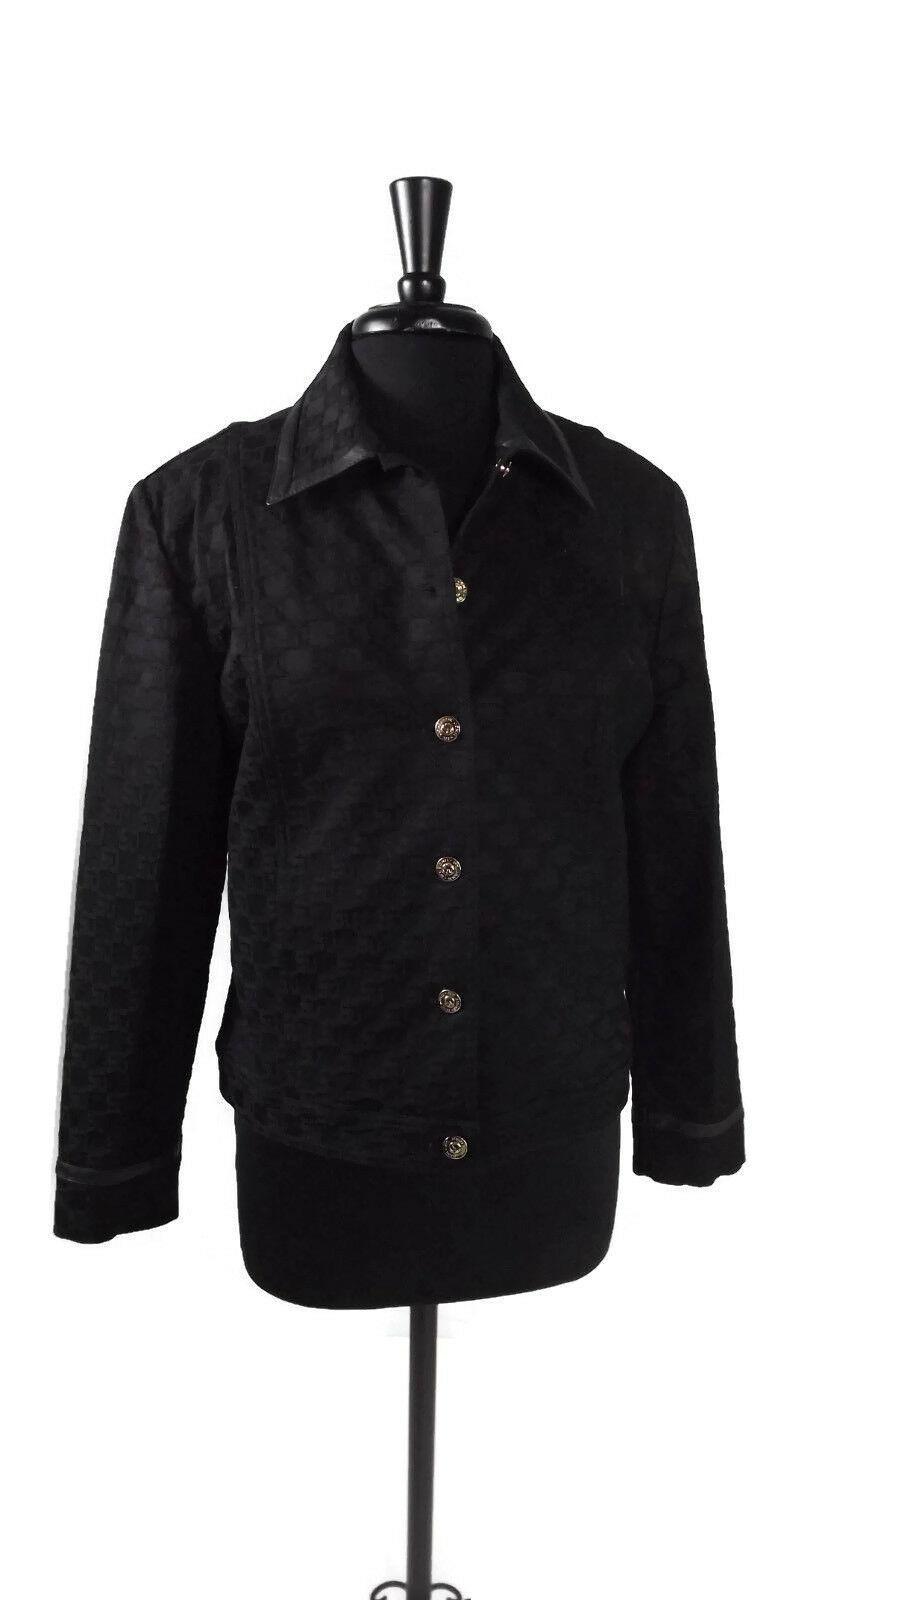 ST. JOHN Womens BLACK Sporty Sports Jacket Leather Trim SJ Buckles Size Medium M - $84.55